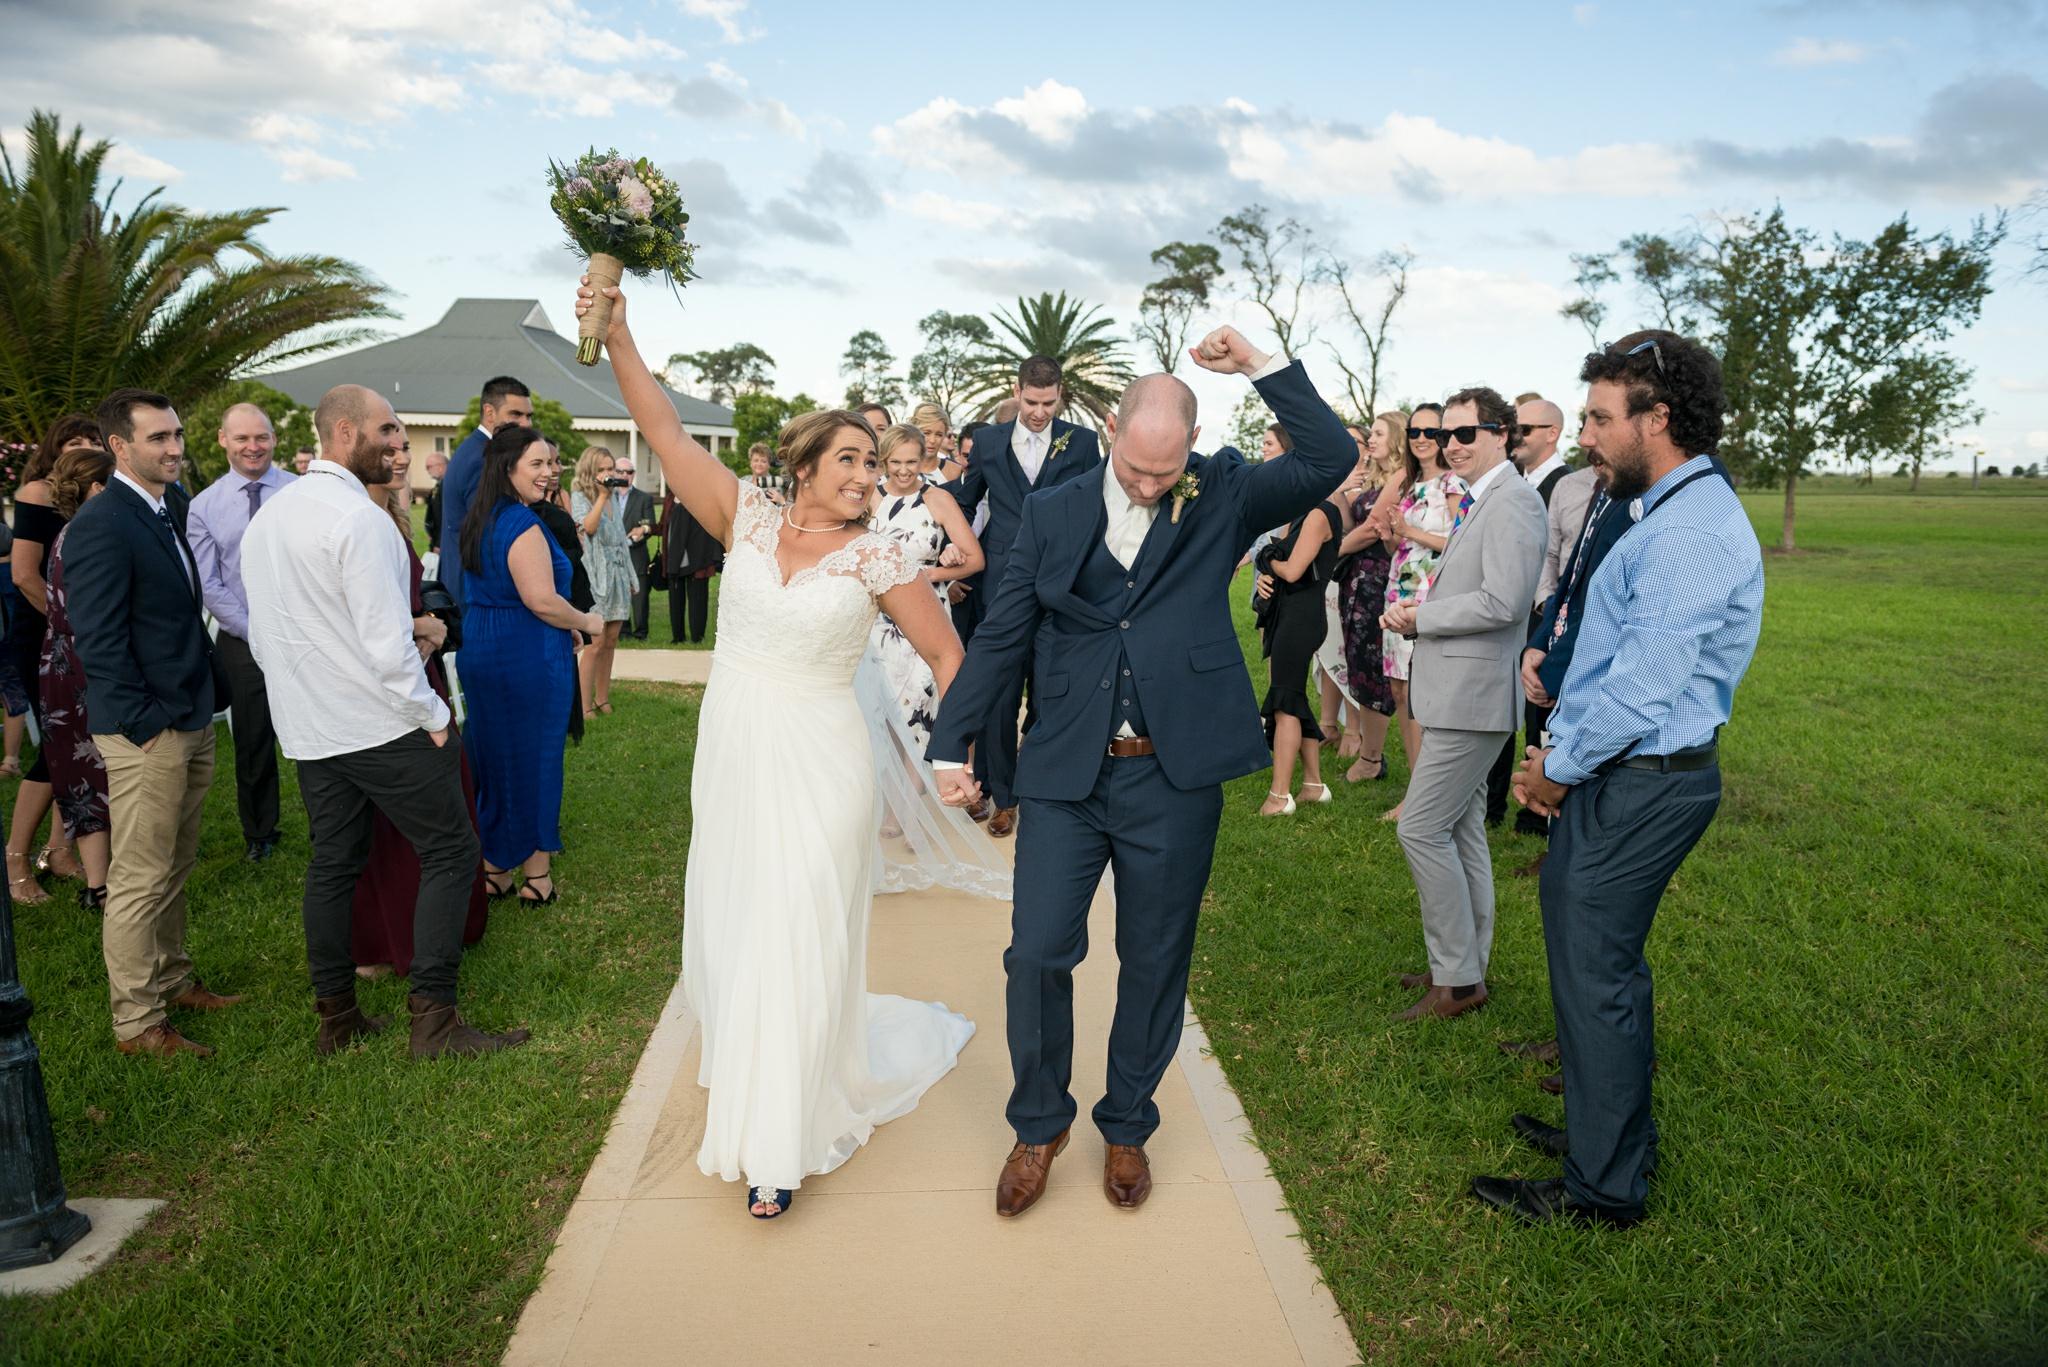 wedding_Andrew-&-Kim_0023.jpg